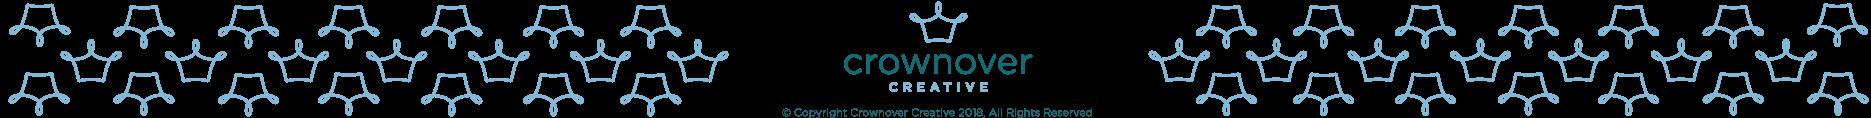 CrownoverCreativeFullLogoBanner.png